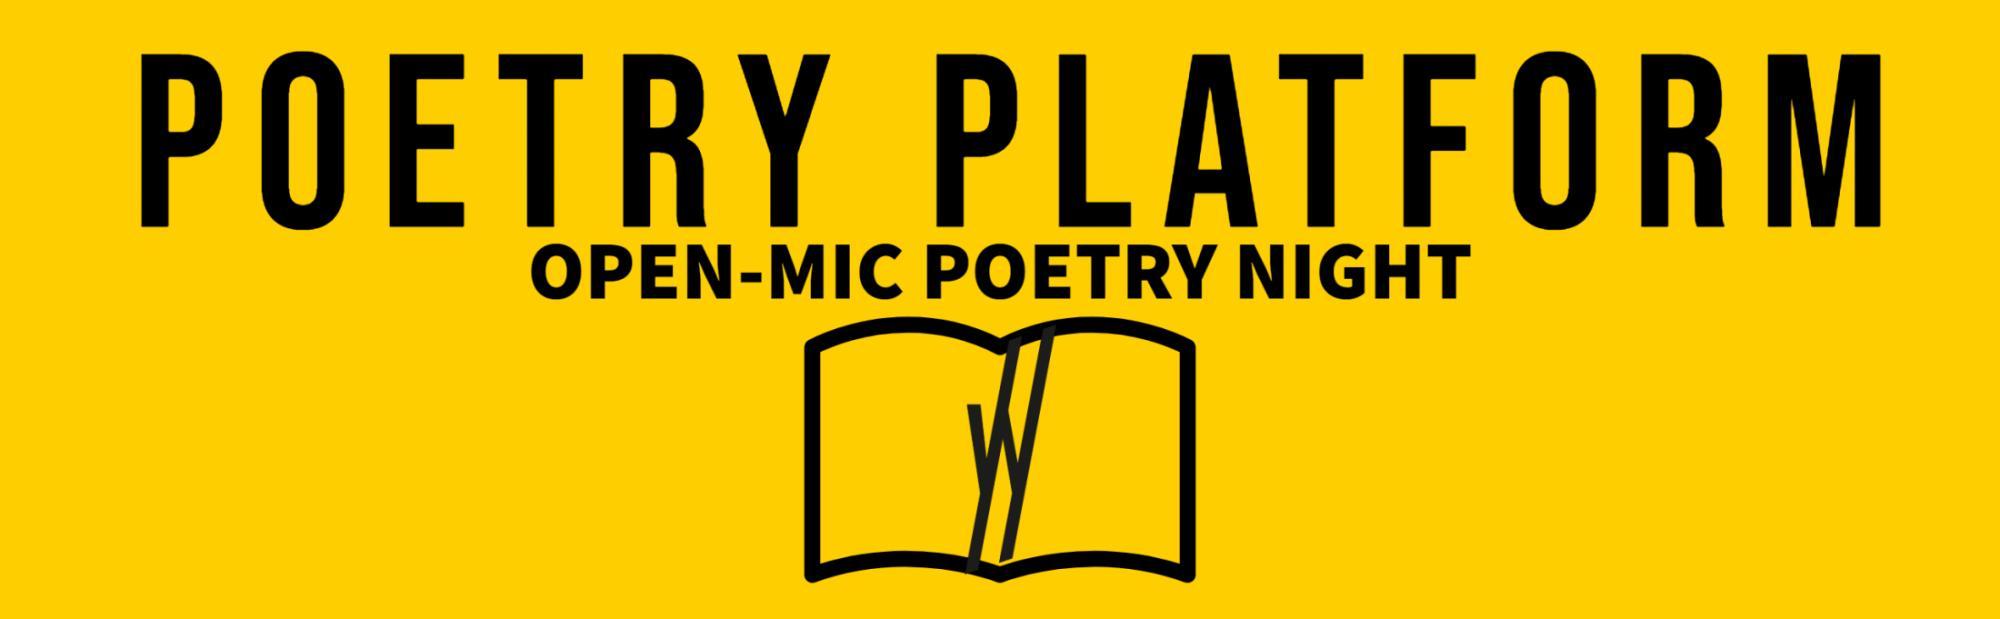 Poetry Platform